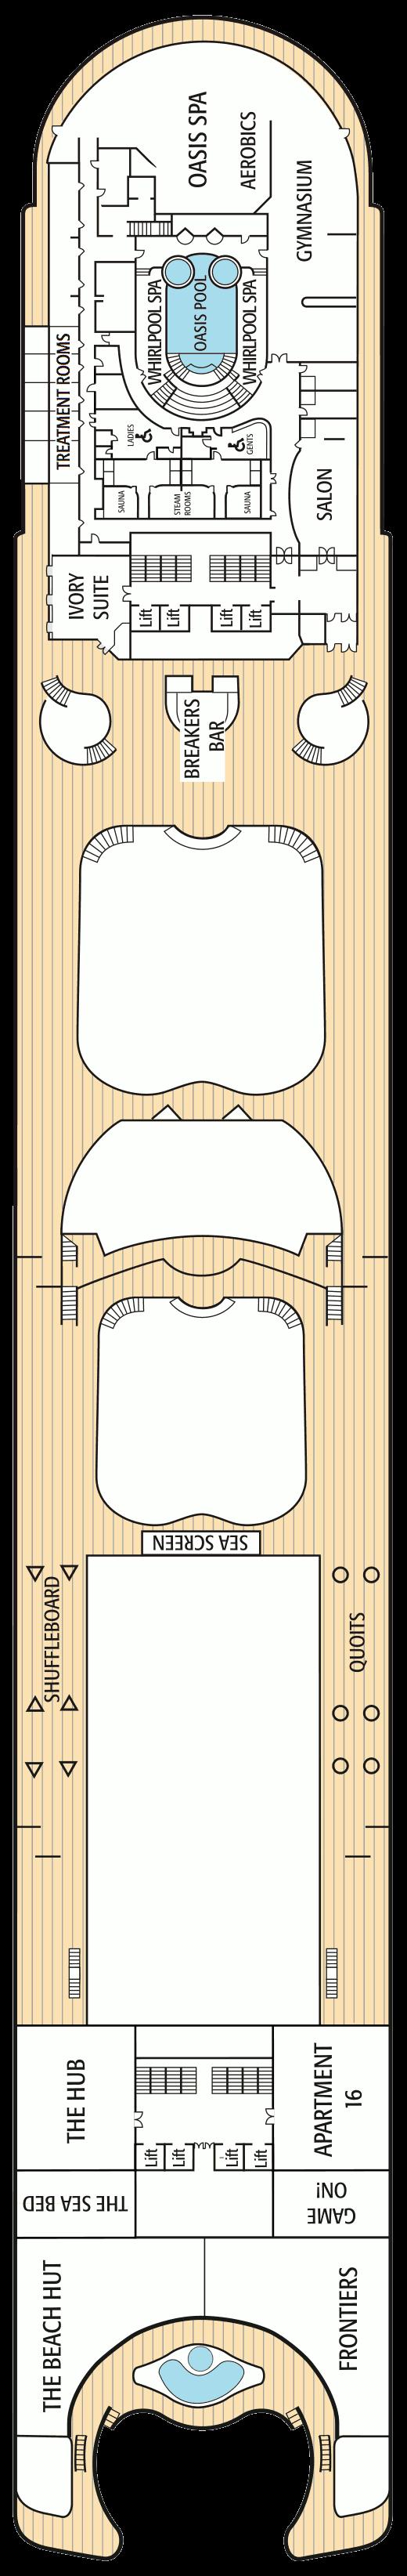 Azura Deck 16